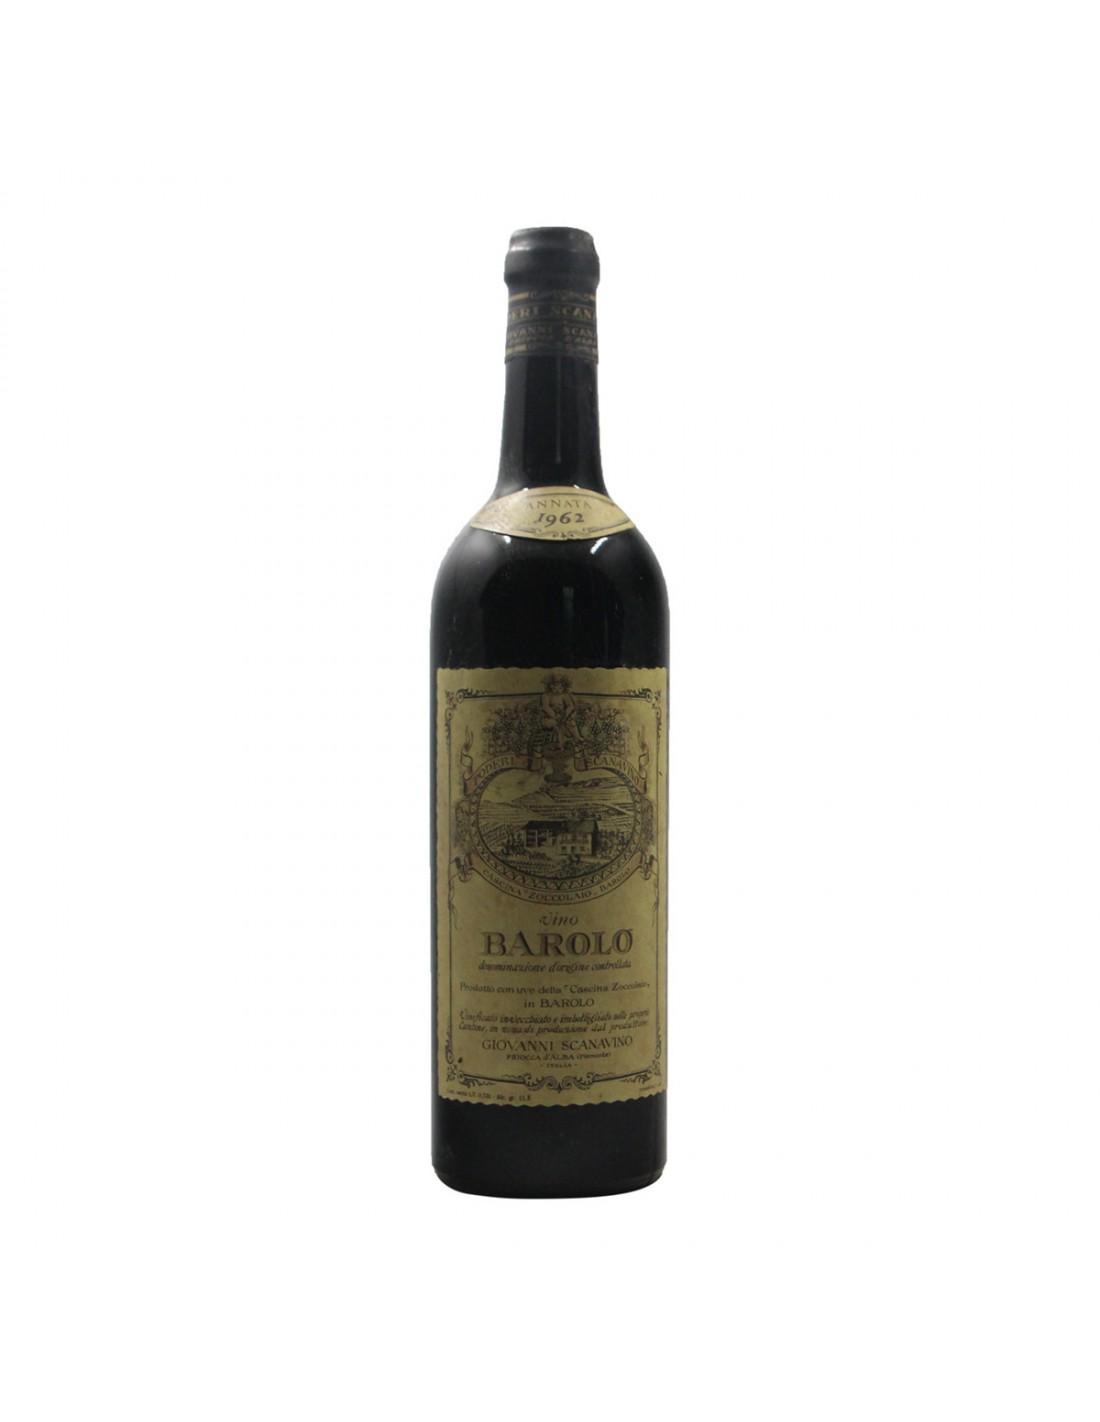 BAROLO 1962 SCANAVINO Grandi Bottiglie